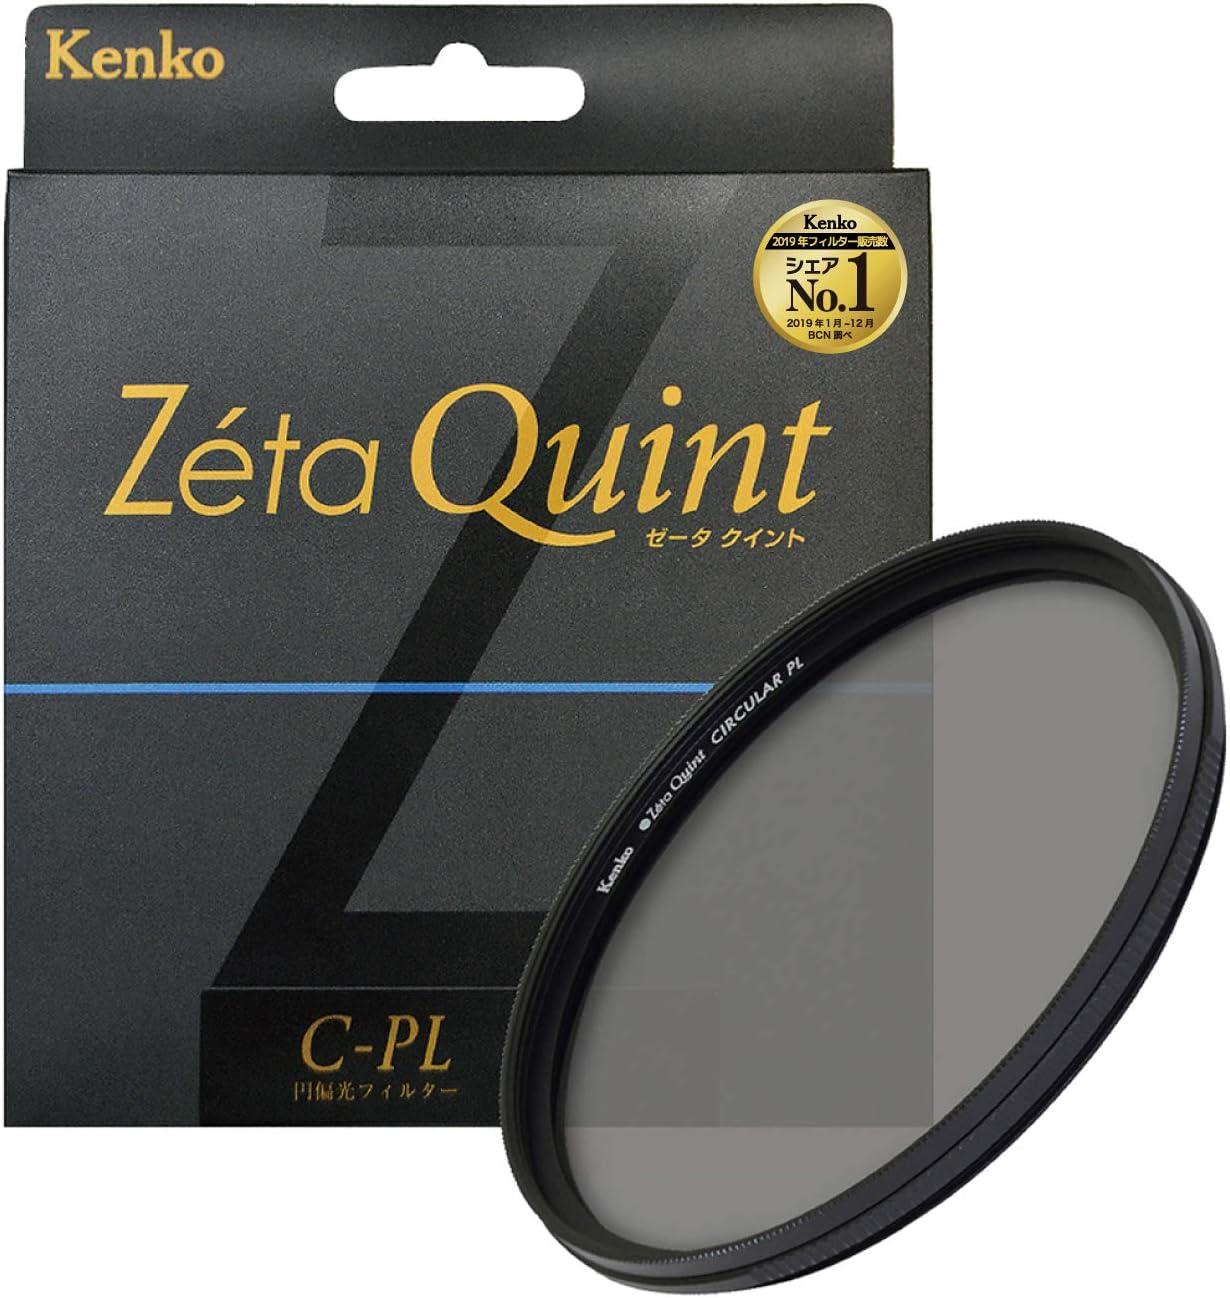 - Zr-Coated Tempered Glass Slim Frame Kenko 67mm Zeta Quint Circular Polarizer C-PL Finest Camera Lens Filters